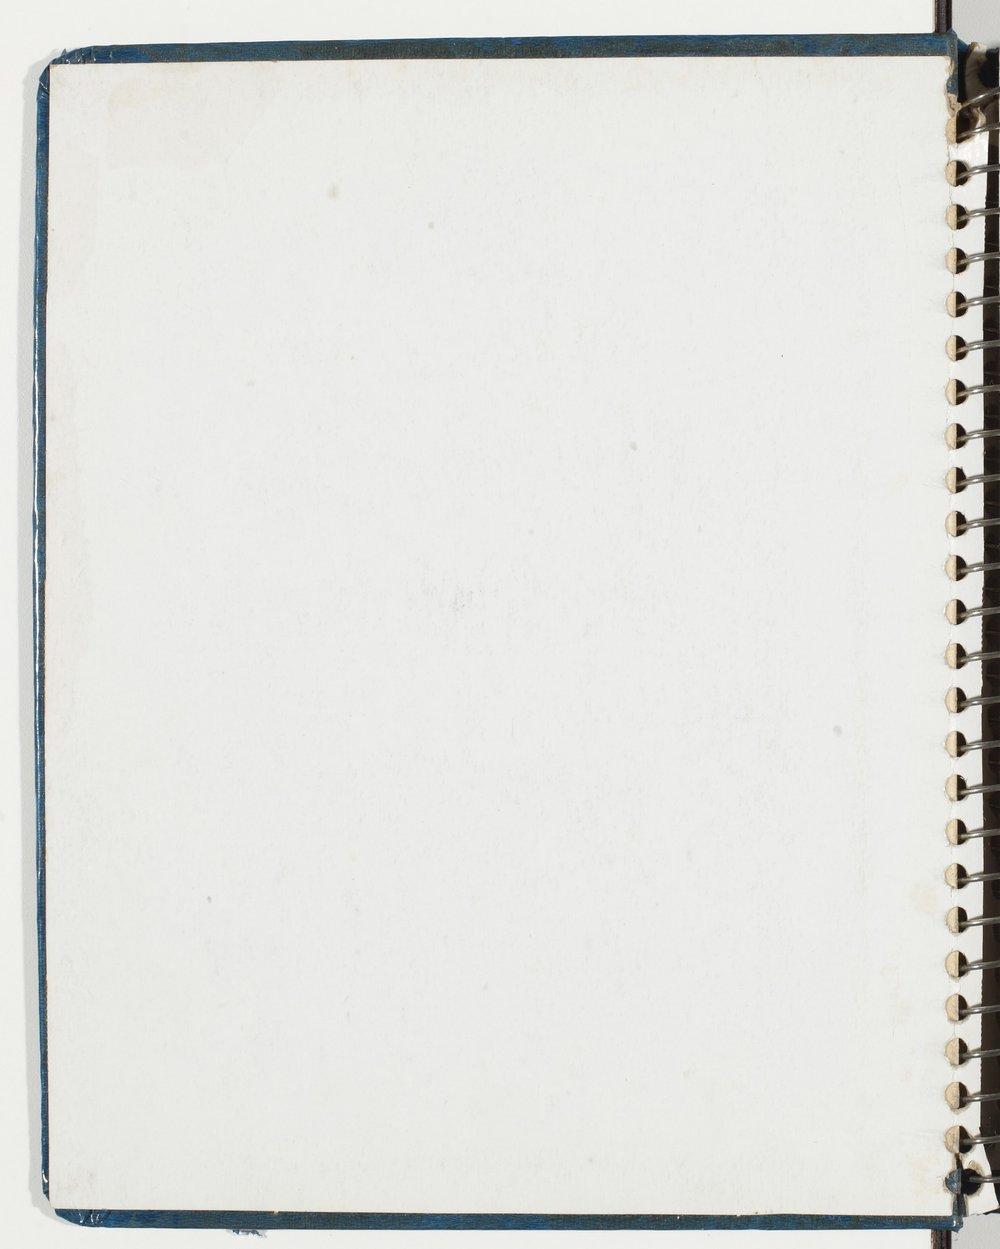 Todd Strait's scrapbooks - Inside cover